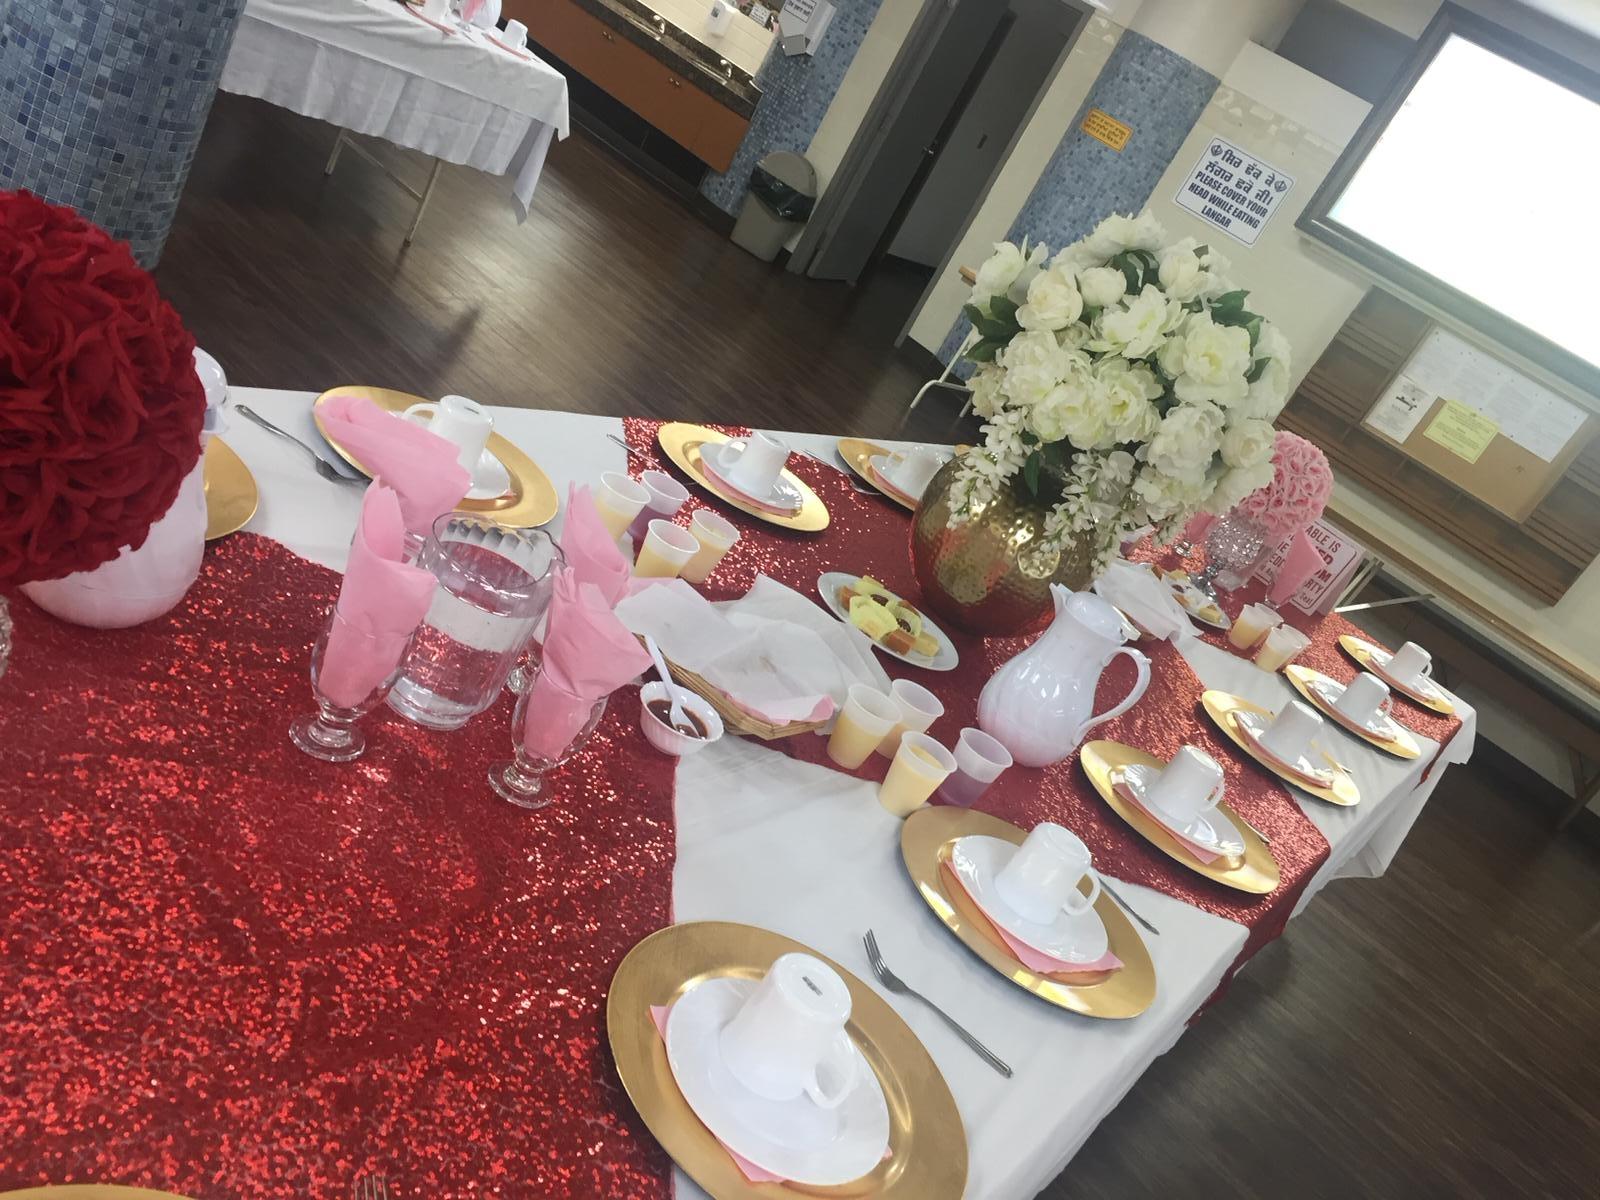 Sikh Wedding Breakfast Catering At Akali Singh Sikh Temple